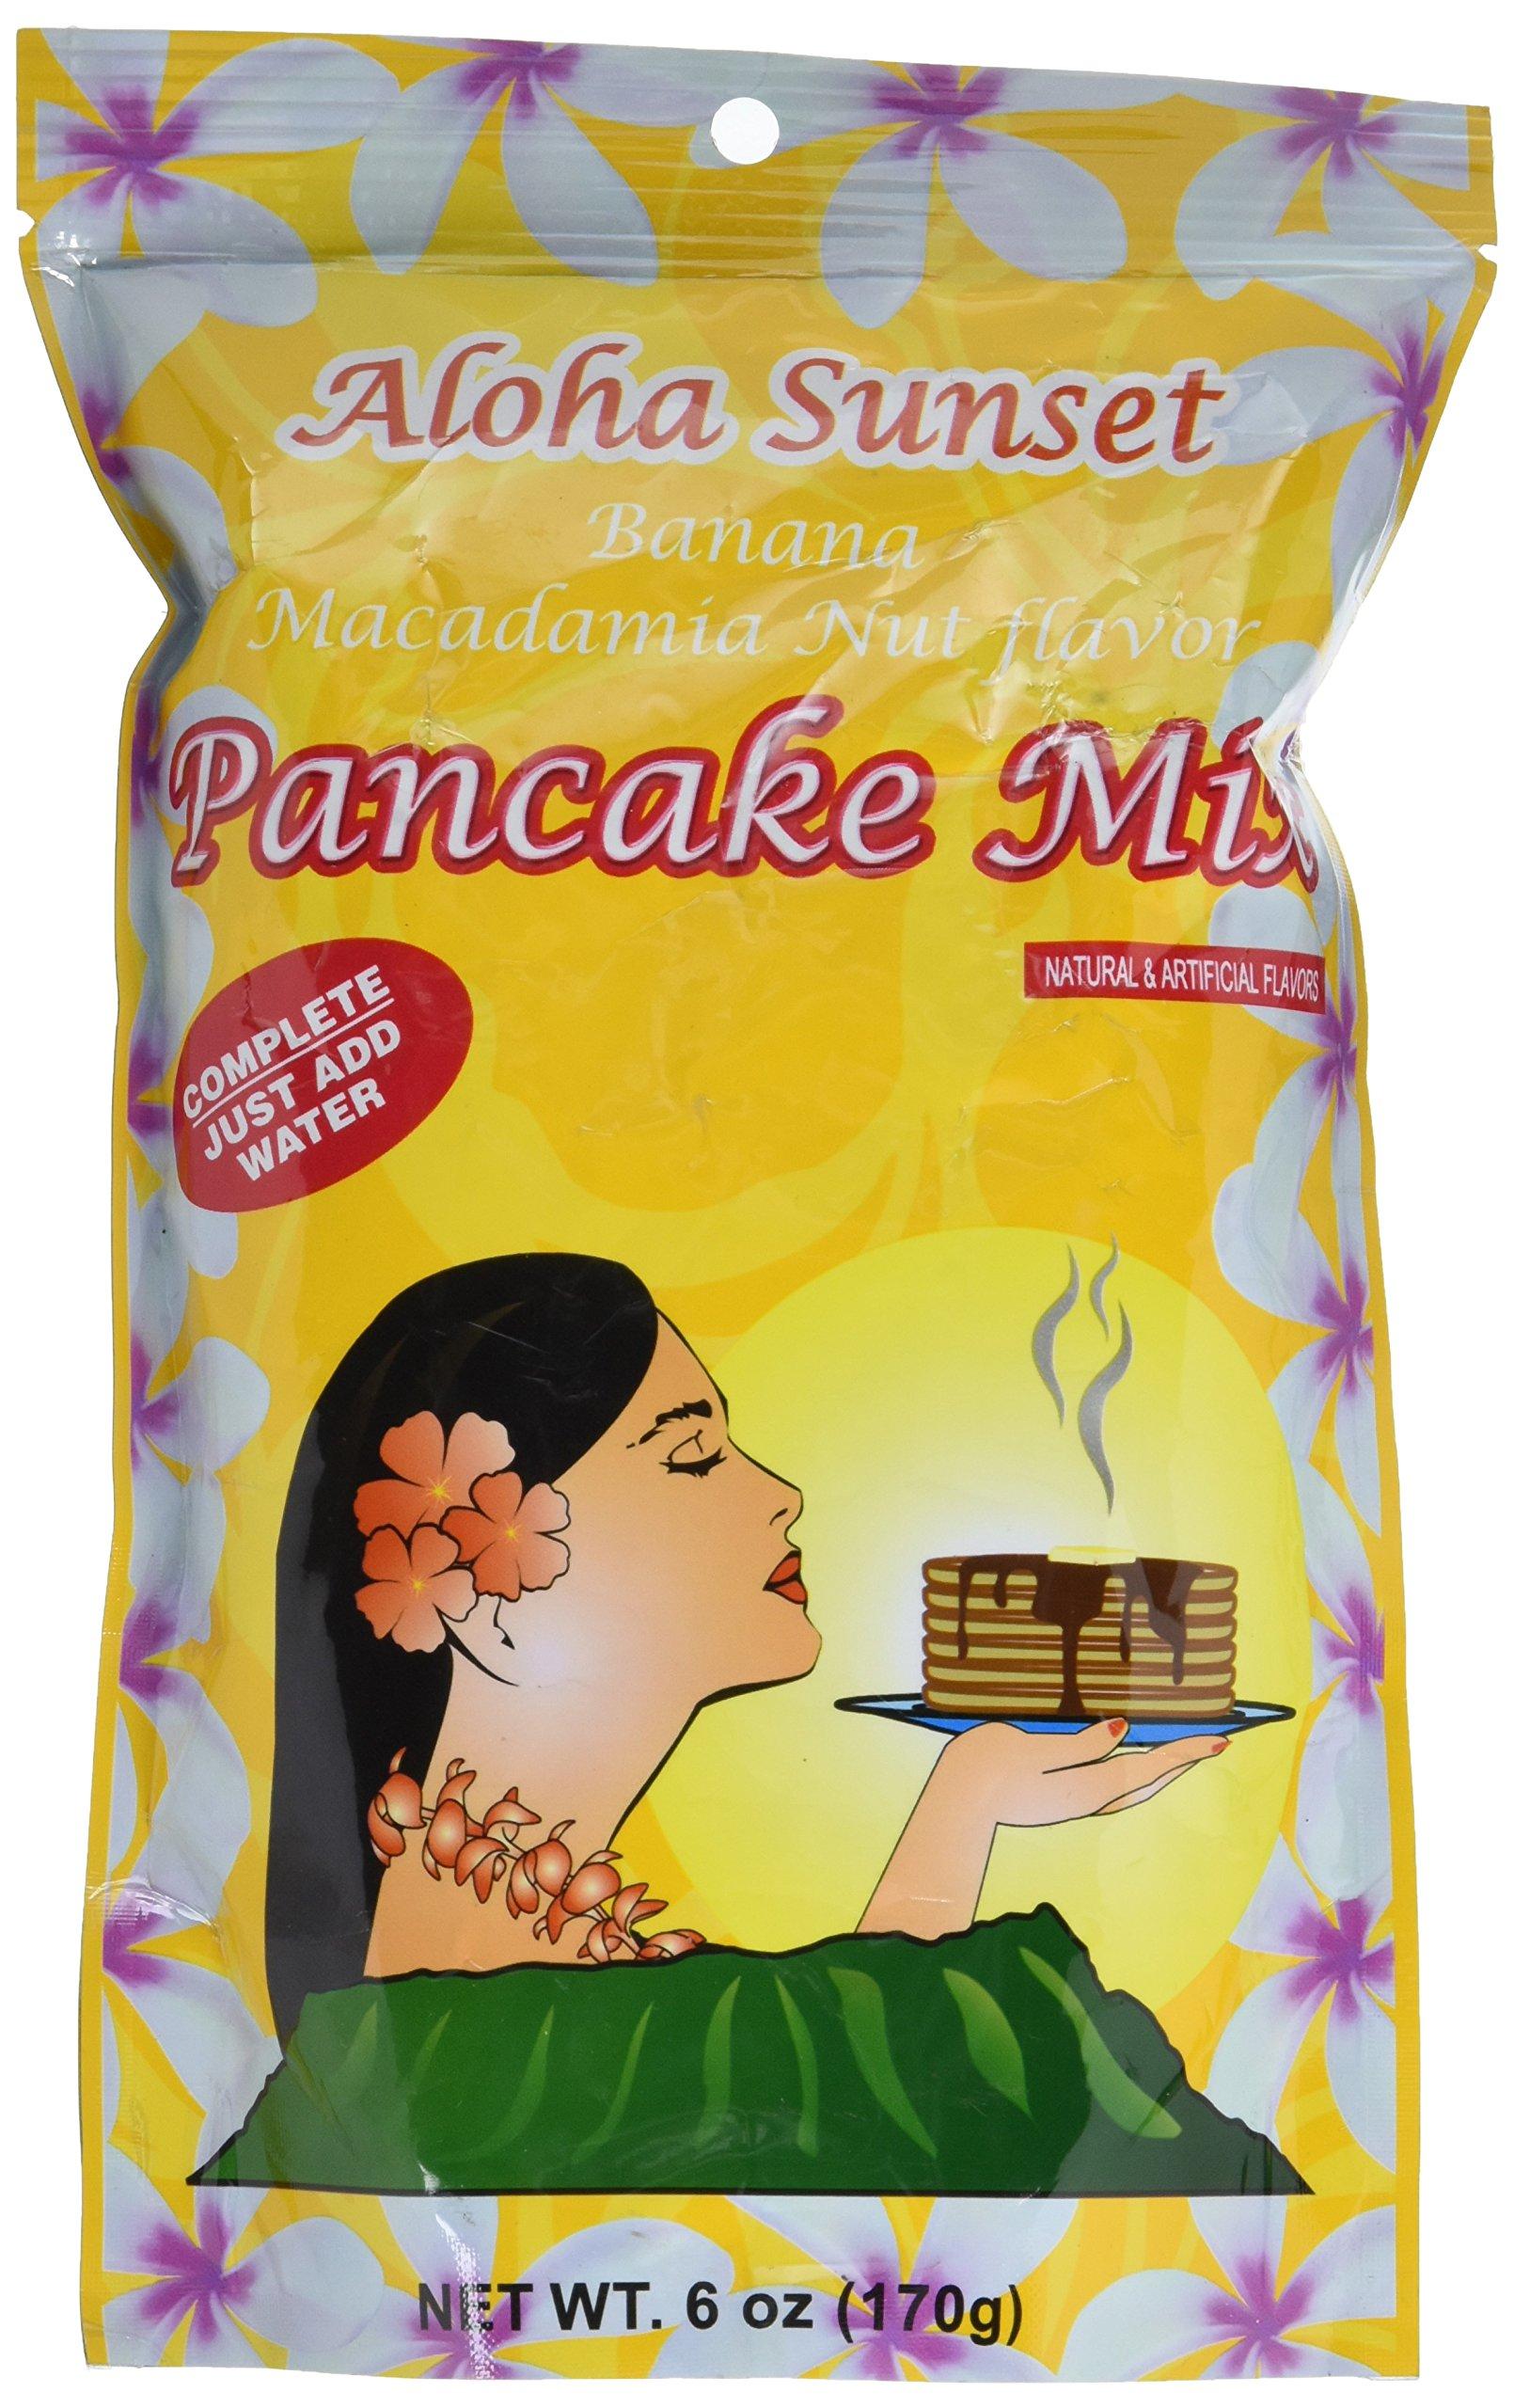 Banana Macadamia Nut Pancake Mix From Hawaii